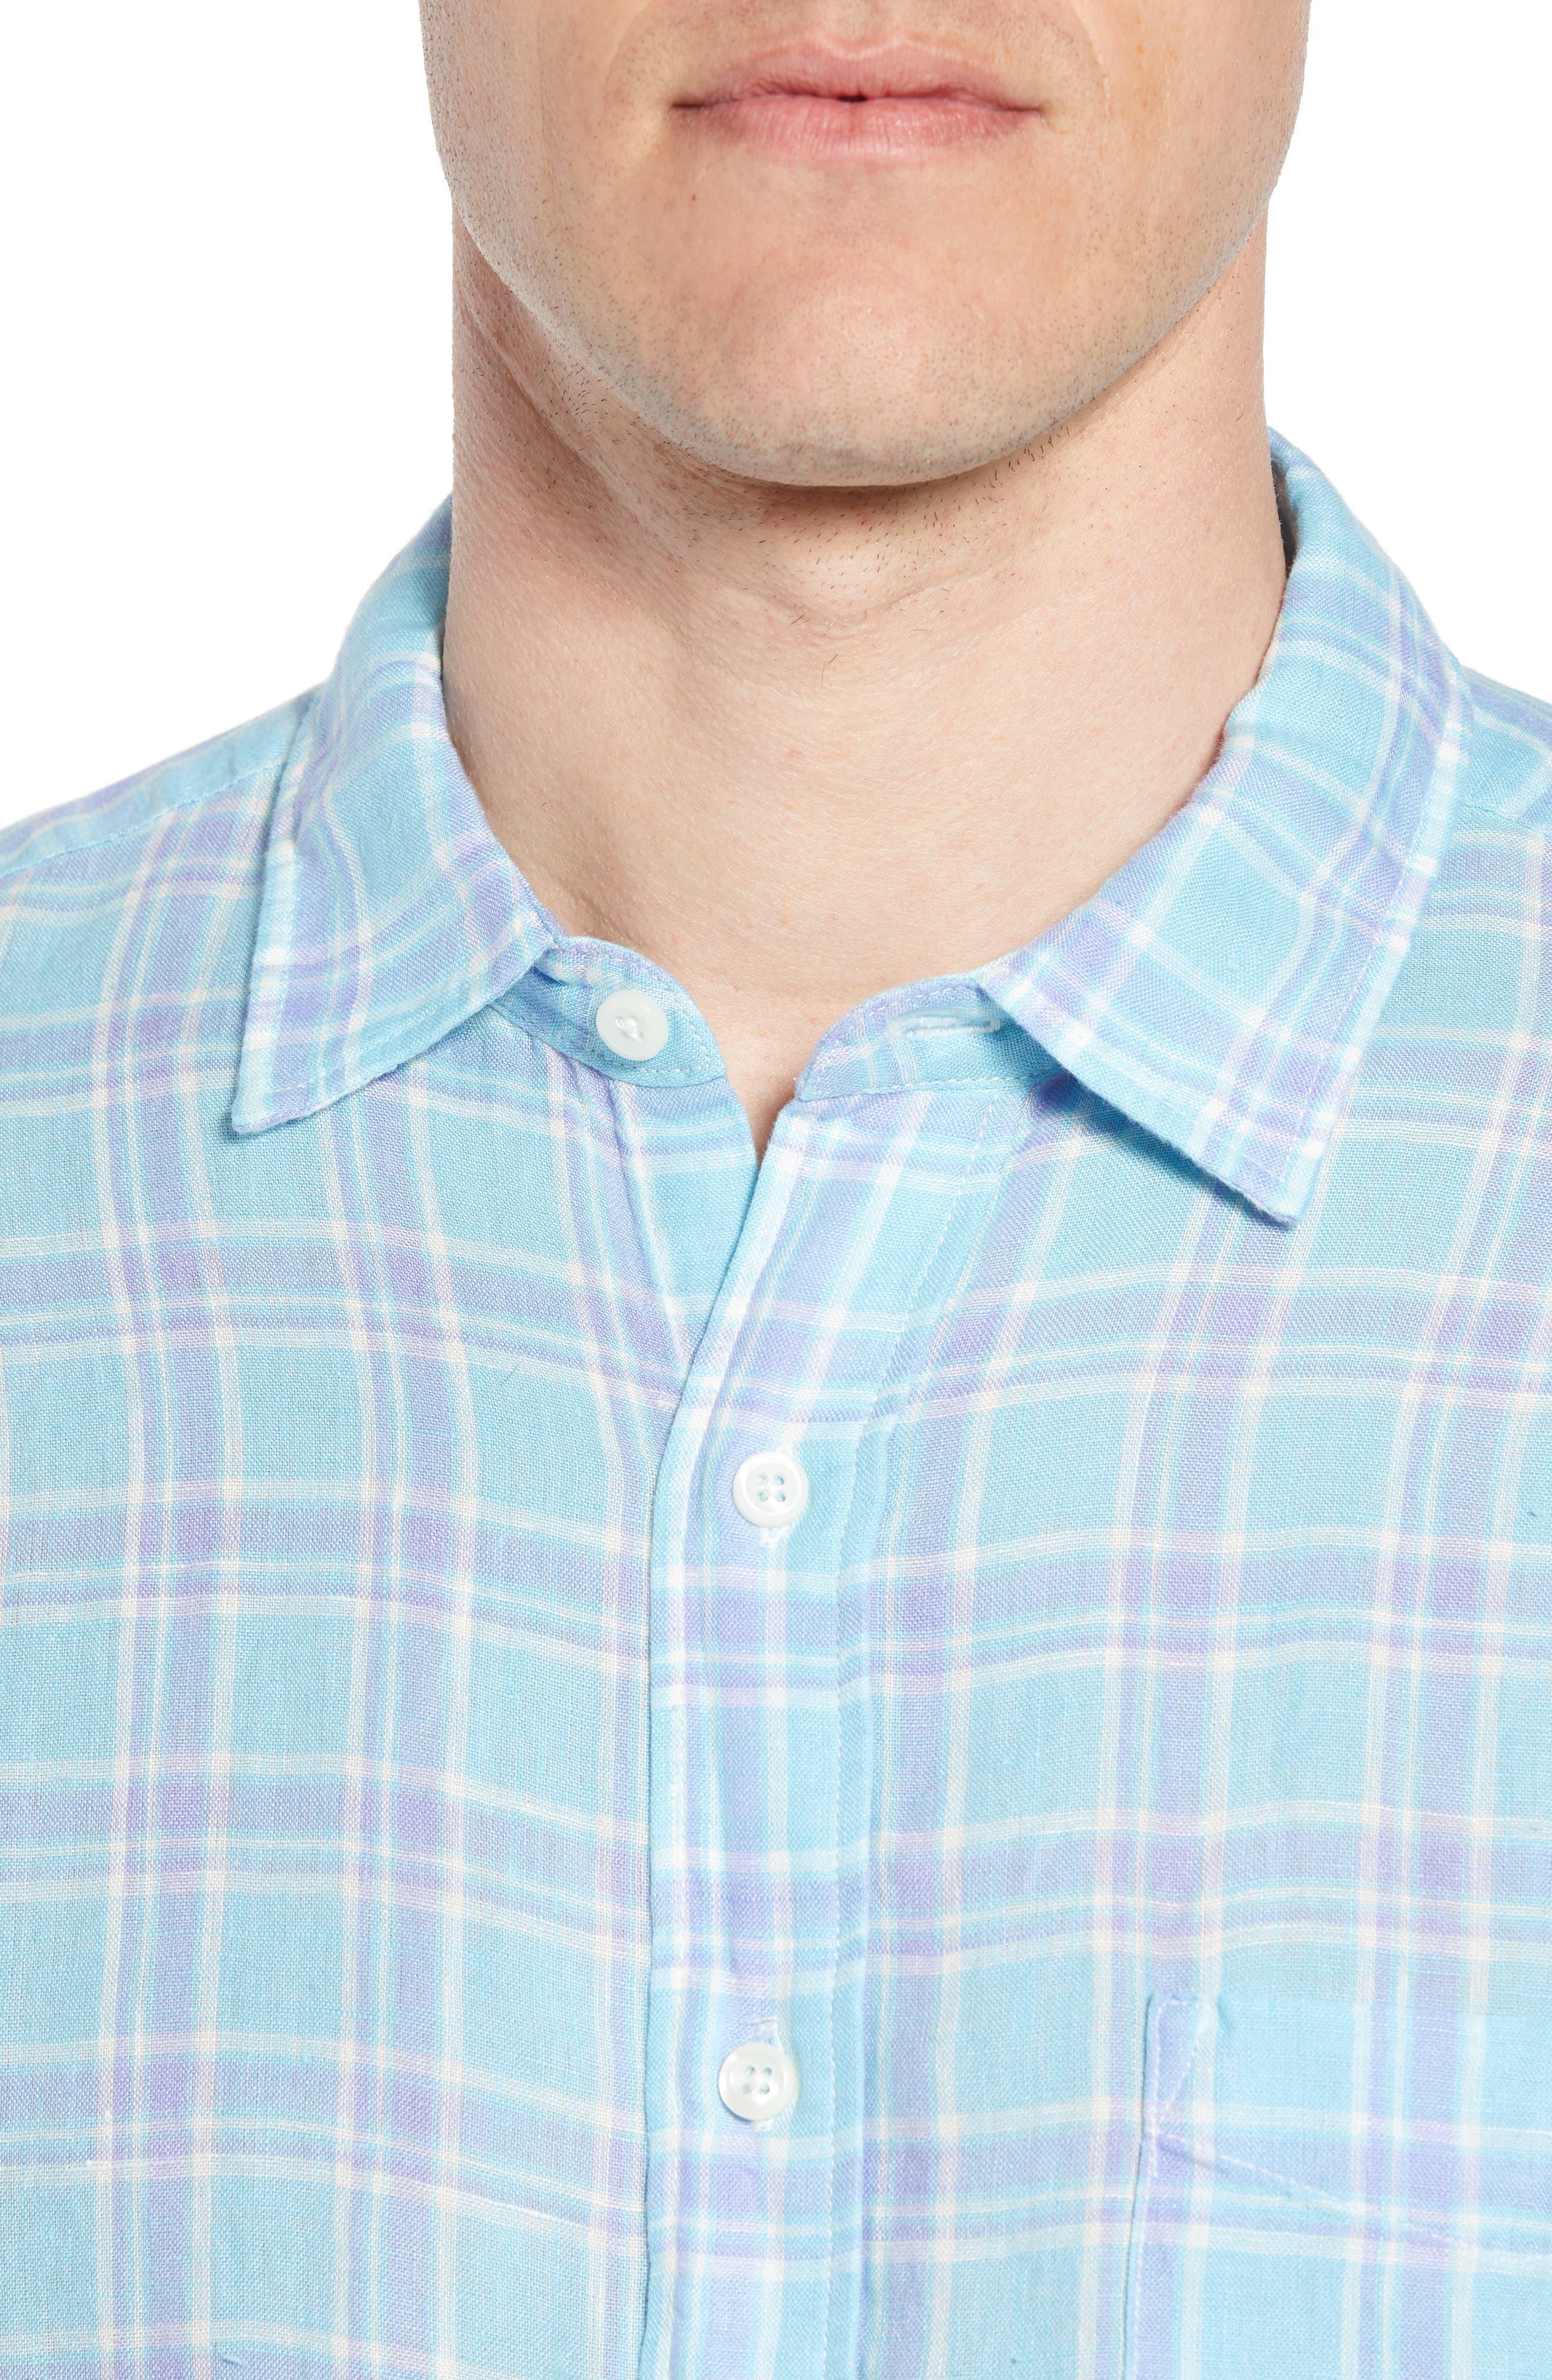 Ventura Plaid Linen Sport Shirt,                             Alternate thumbnail 2, color,                             Teal Purple Plaid